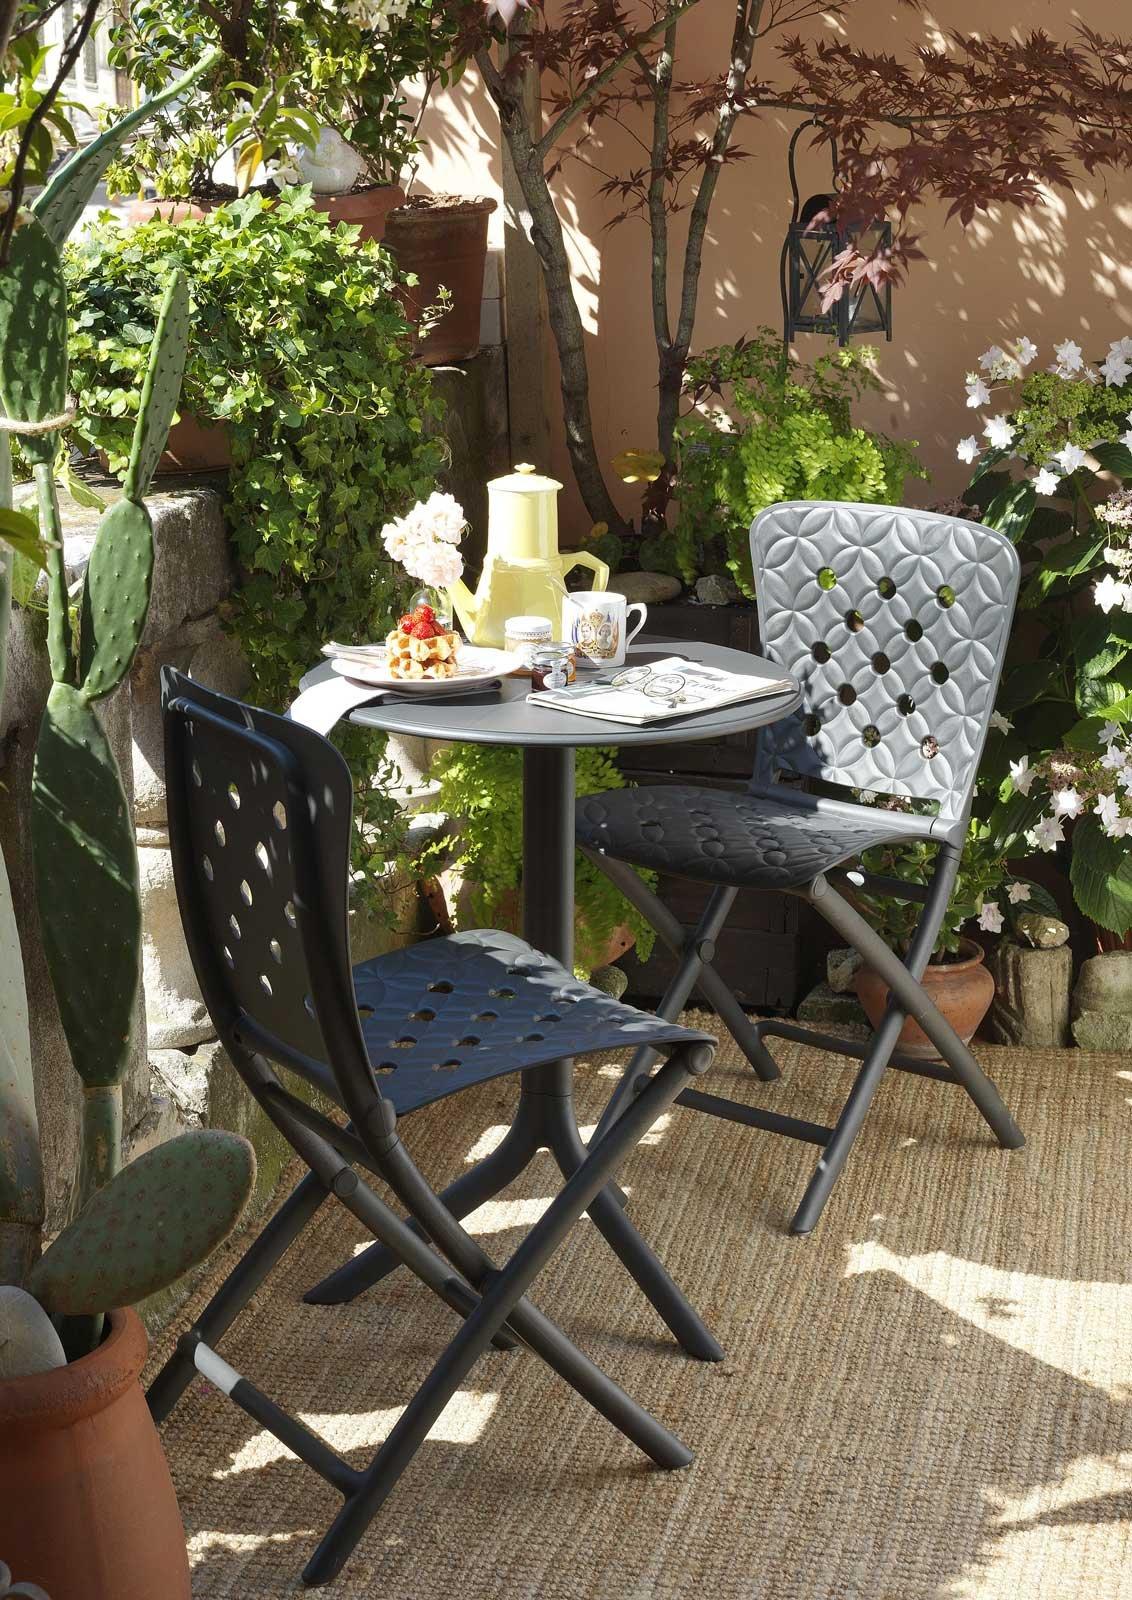 Tavoli e sedie da giardino usati milano : tavoli da esterno ...